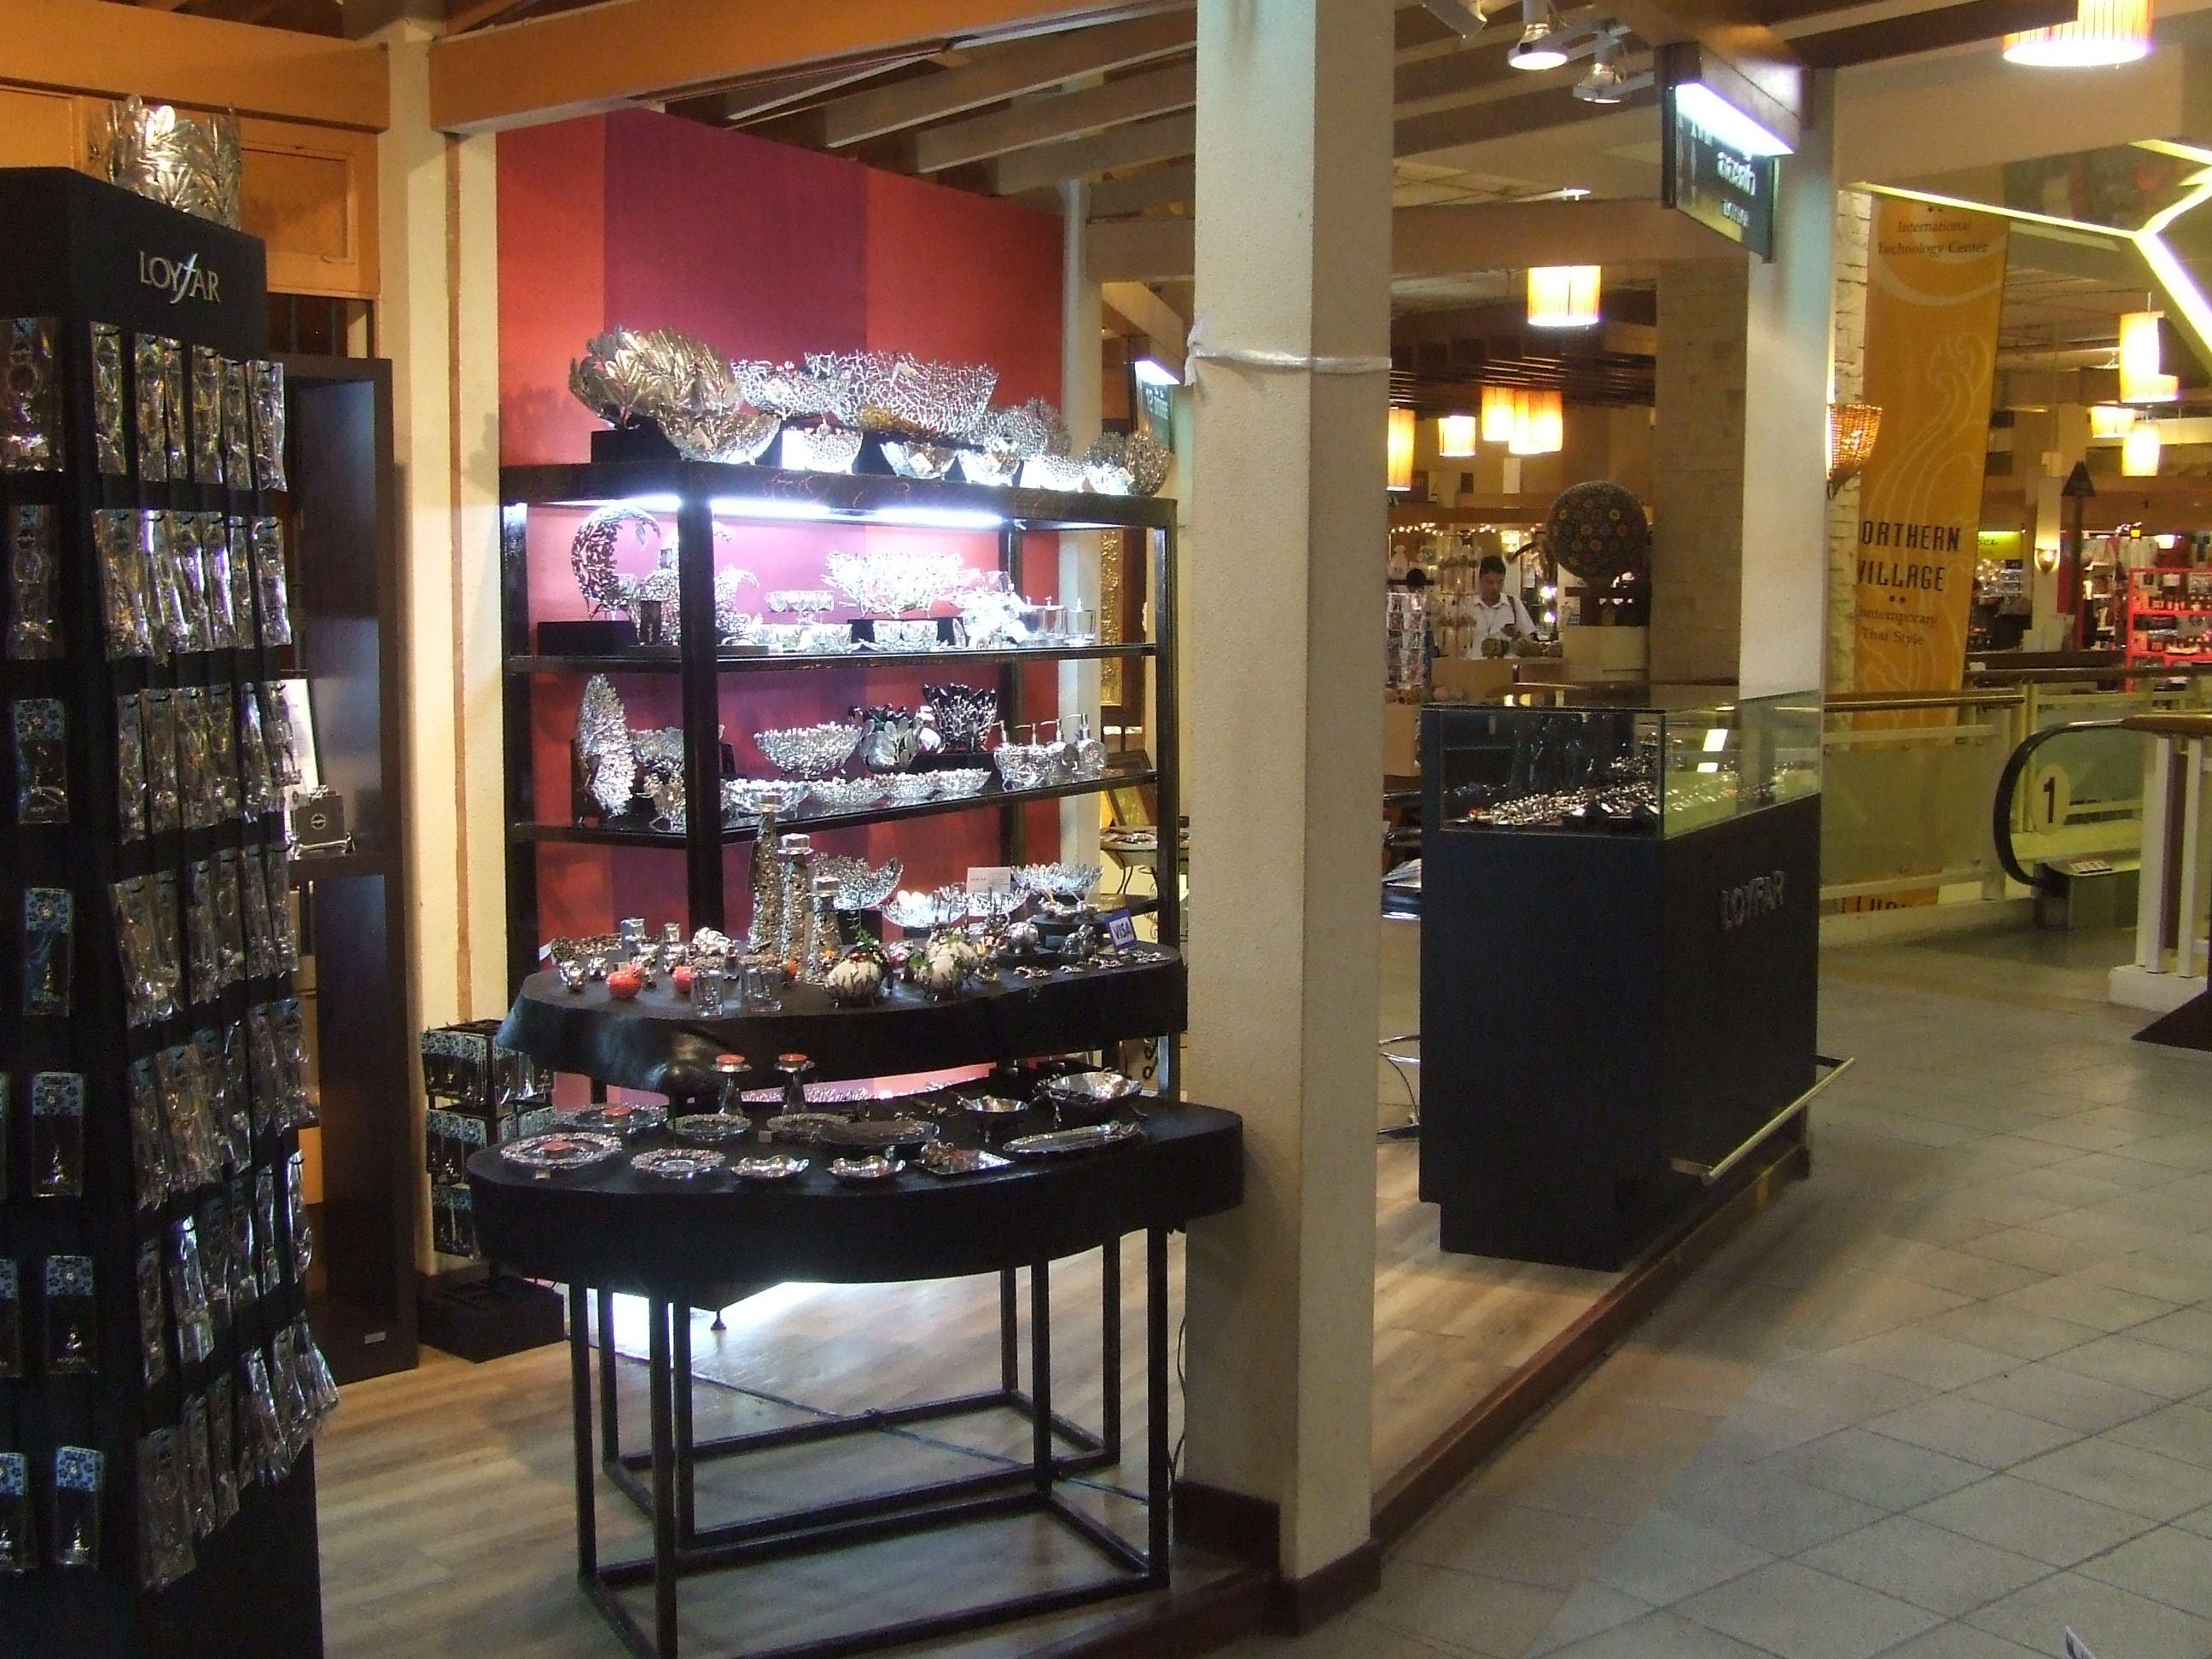 Loyfar Shop At Chiangmai Airport Plaza Chiang Mai Welcome To Shopping Pewter Design Product MaiGift WeddingGraduation